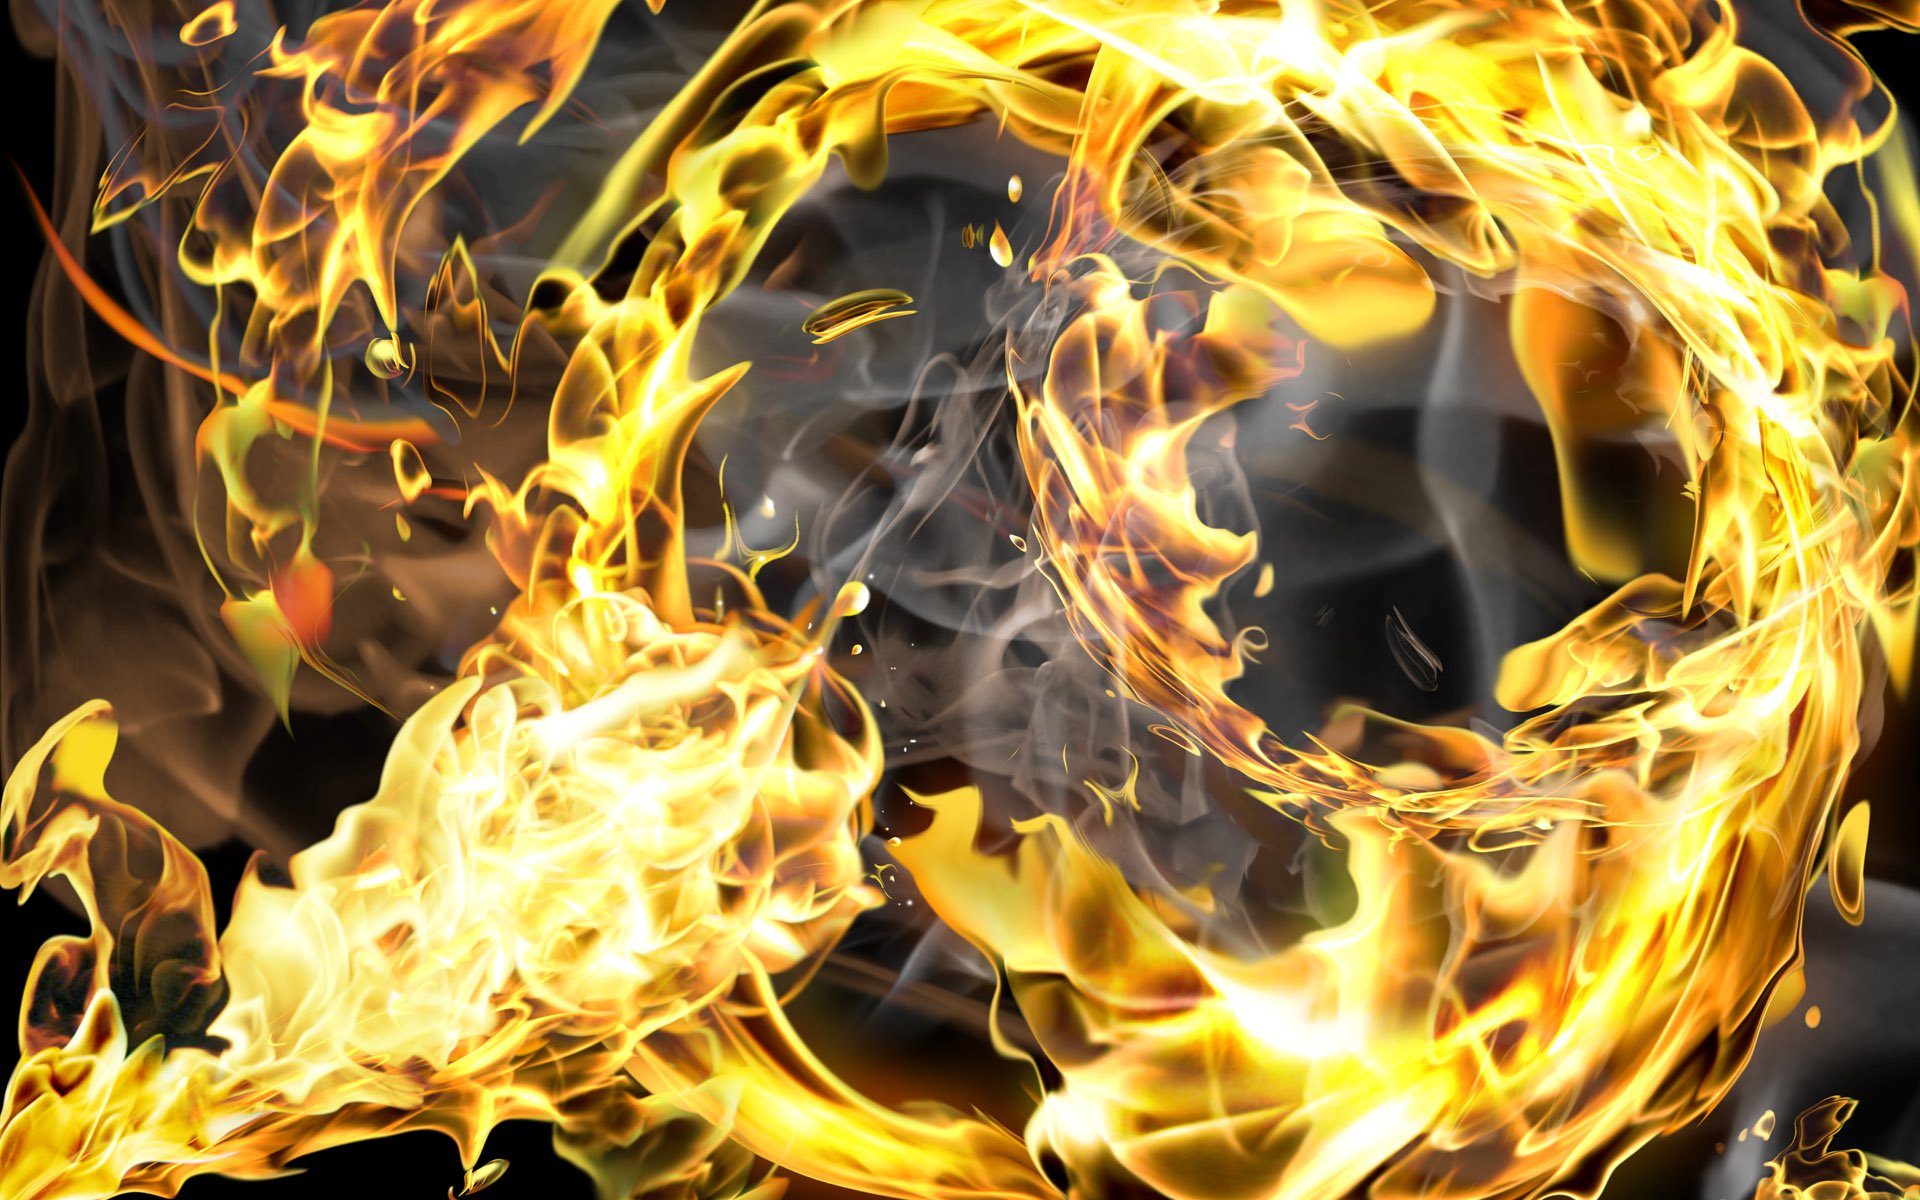 Cool Fire Wallpaper HD Resolution - Mytwiink com